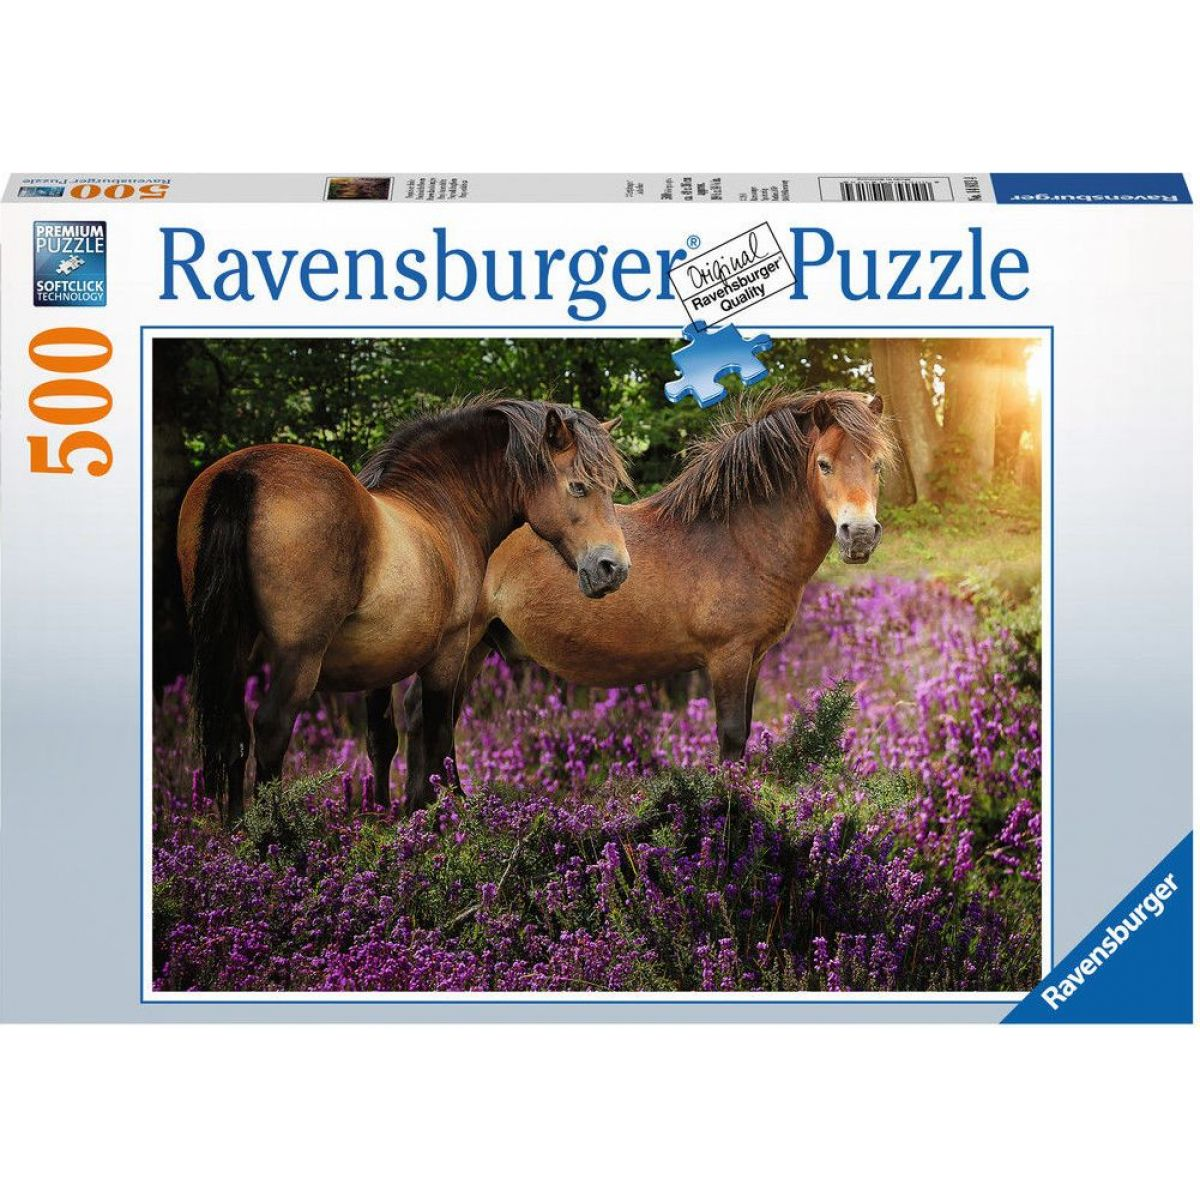 Ravensburger puzzle 148134 Poníky medzi kvetinami 500 dielikov